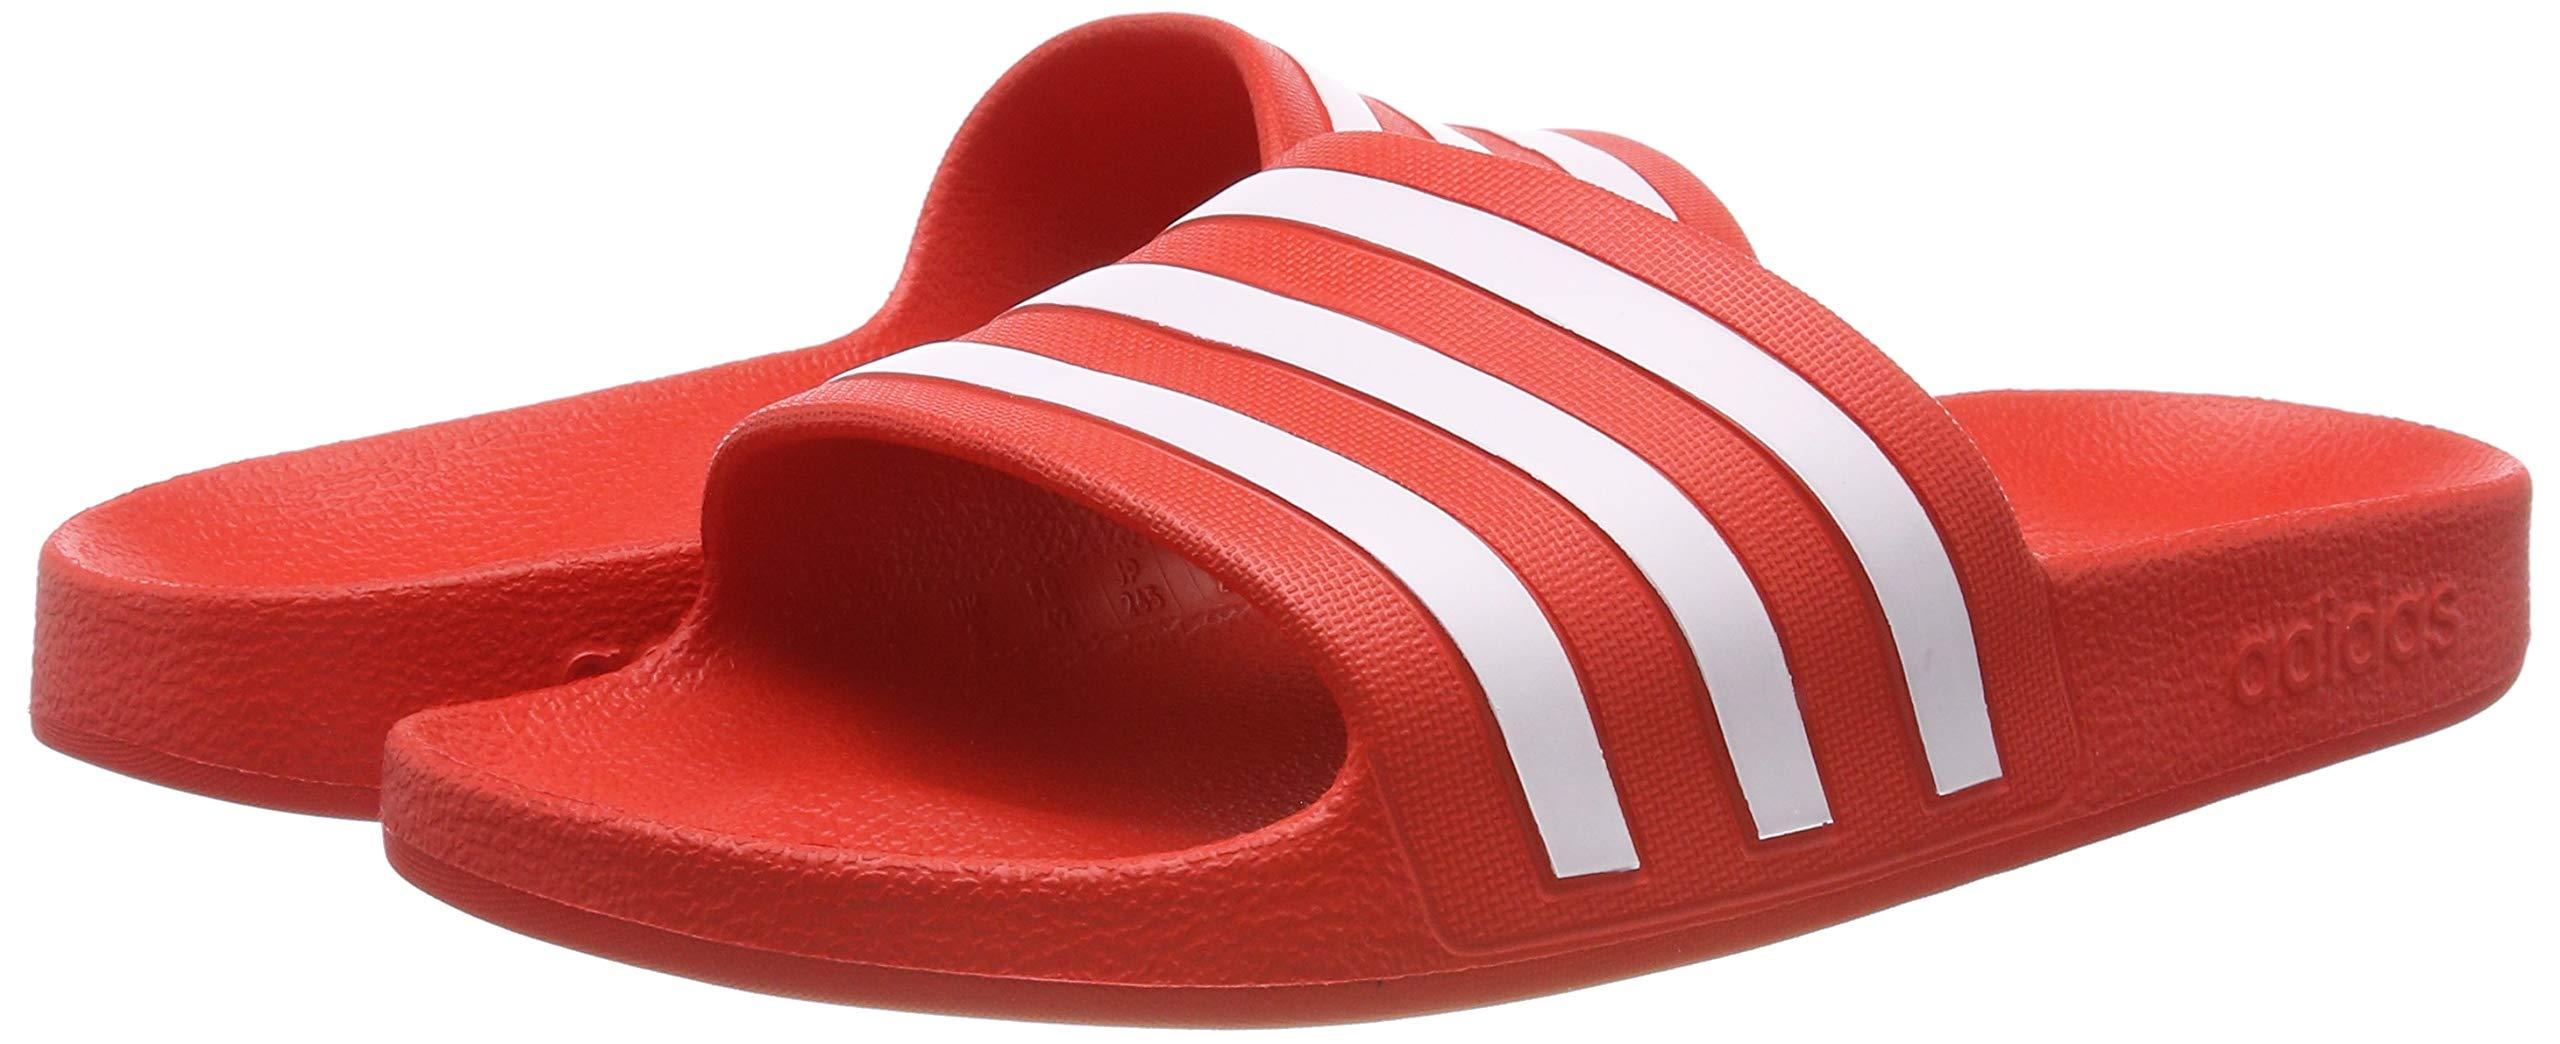 Adidas Adilette Aqua Scarpe da Spiaggia e Piscina Unisex - Adulto 5 spesavip